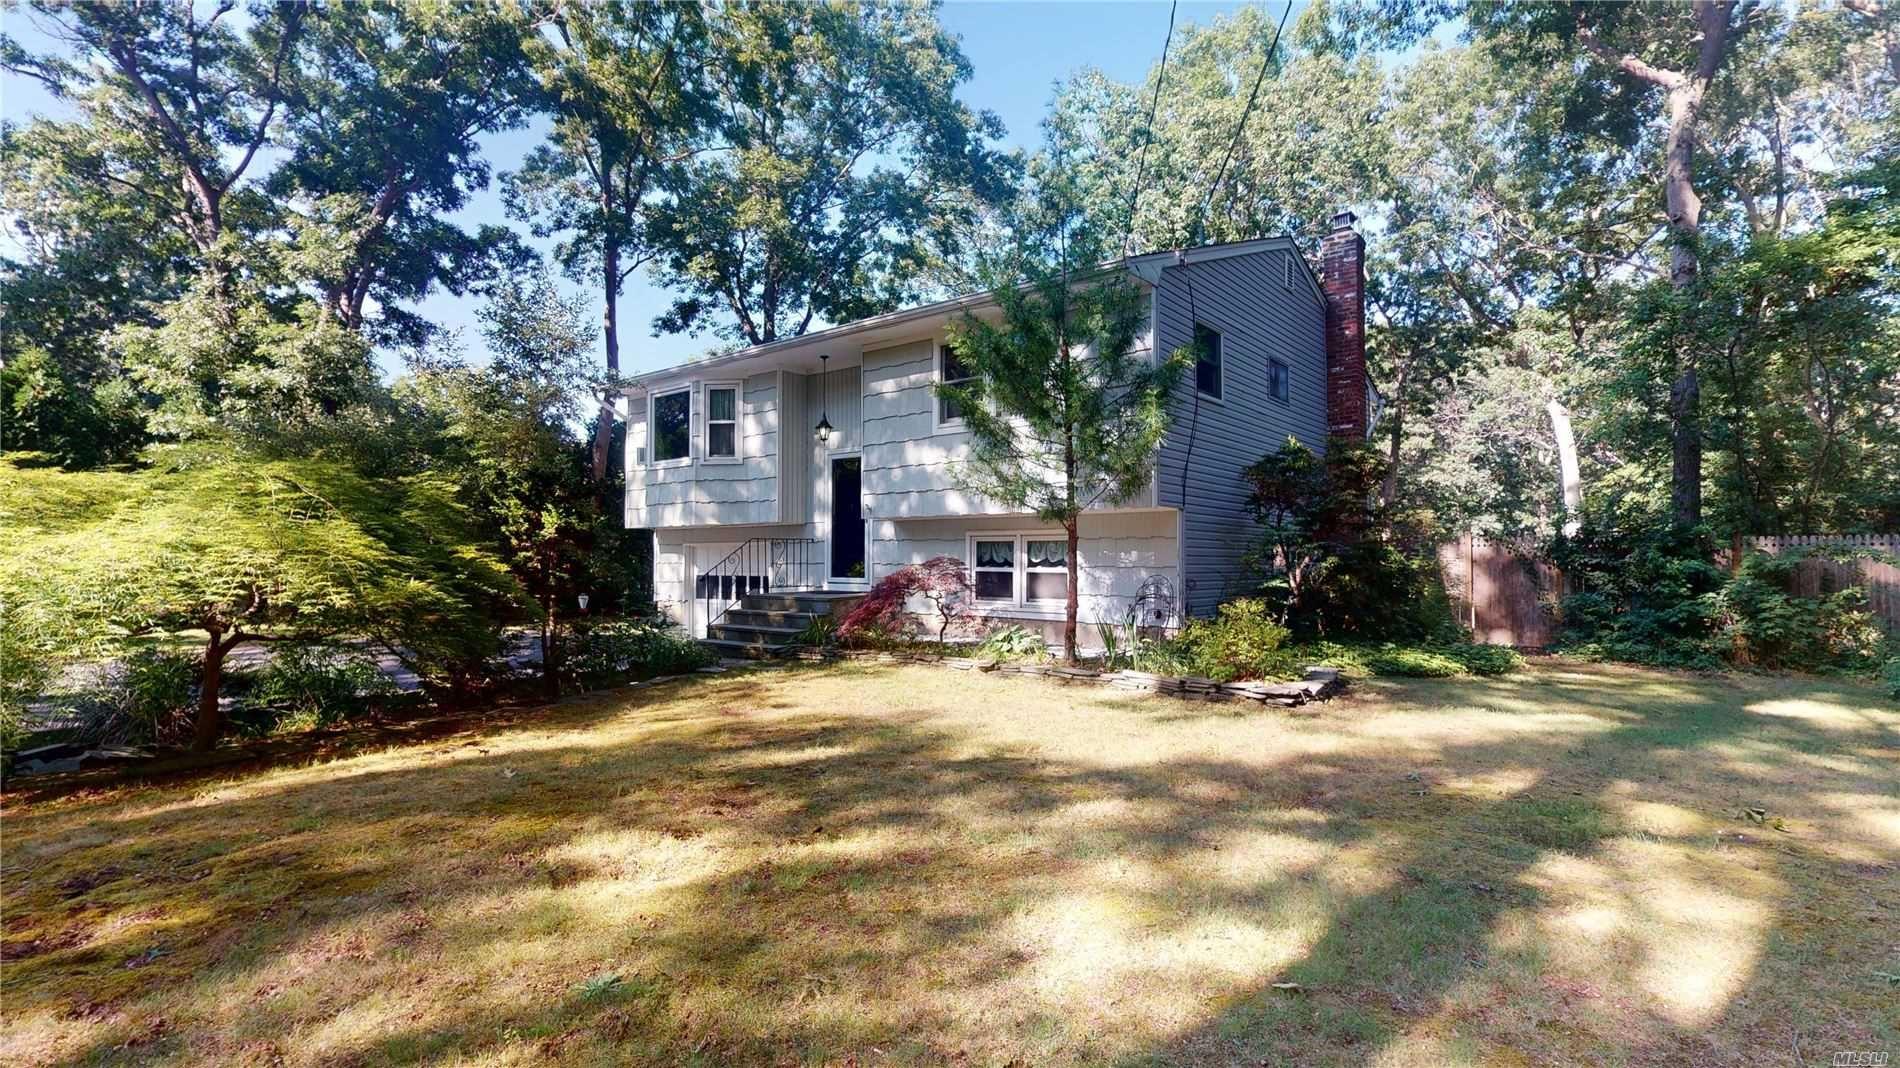 83 Woodlot Rd, Ridge, NY 11961 - MLS#: 3233815